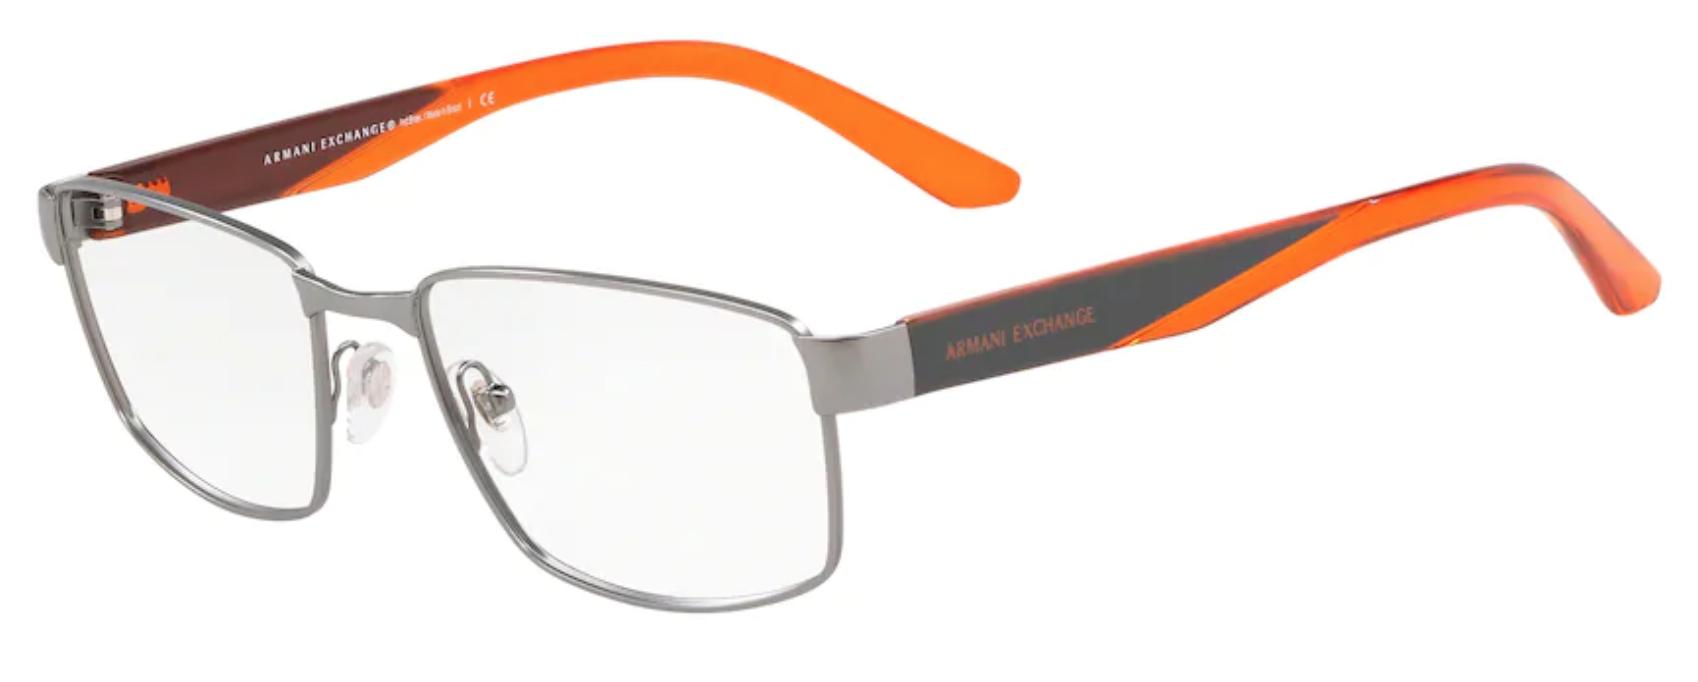 Óculos de Grau Armani Exchange Masculino AX 1036 6088 Tam.55